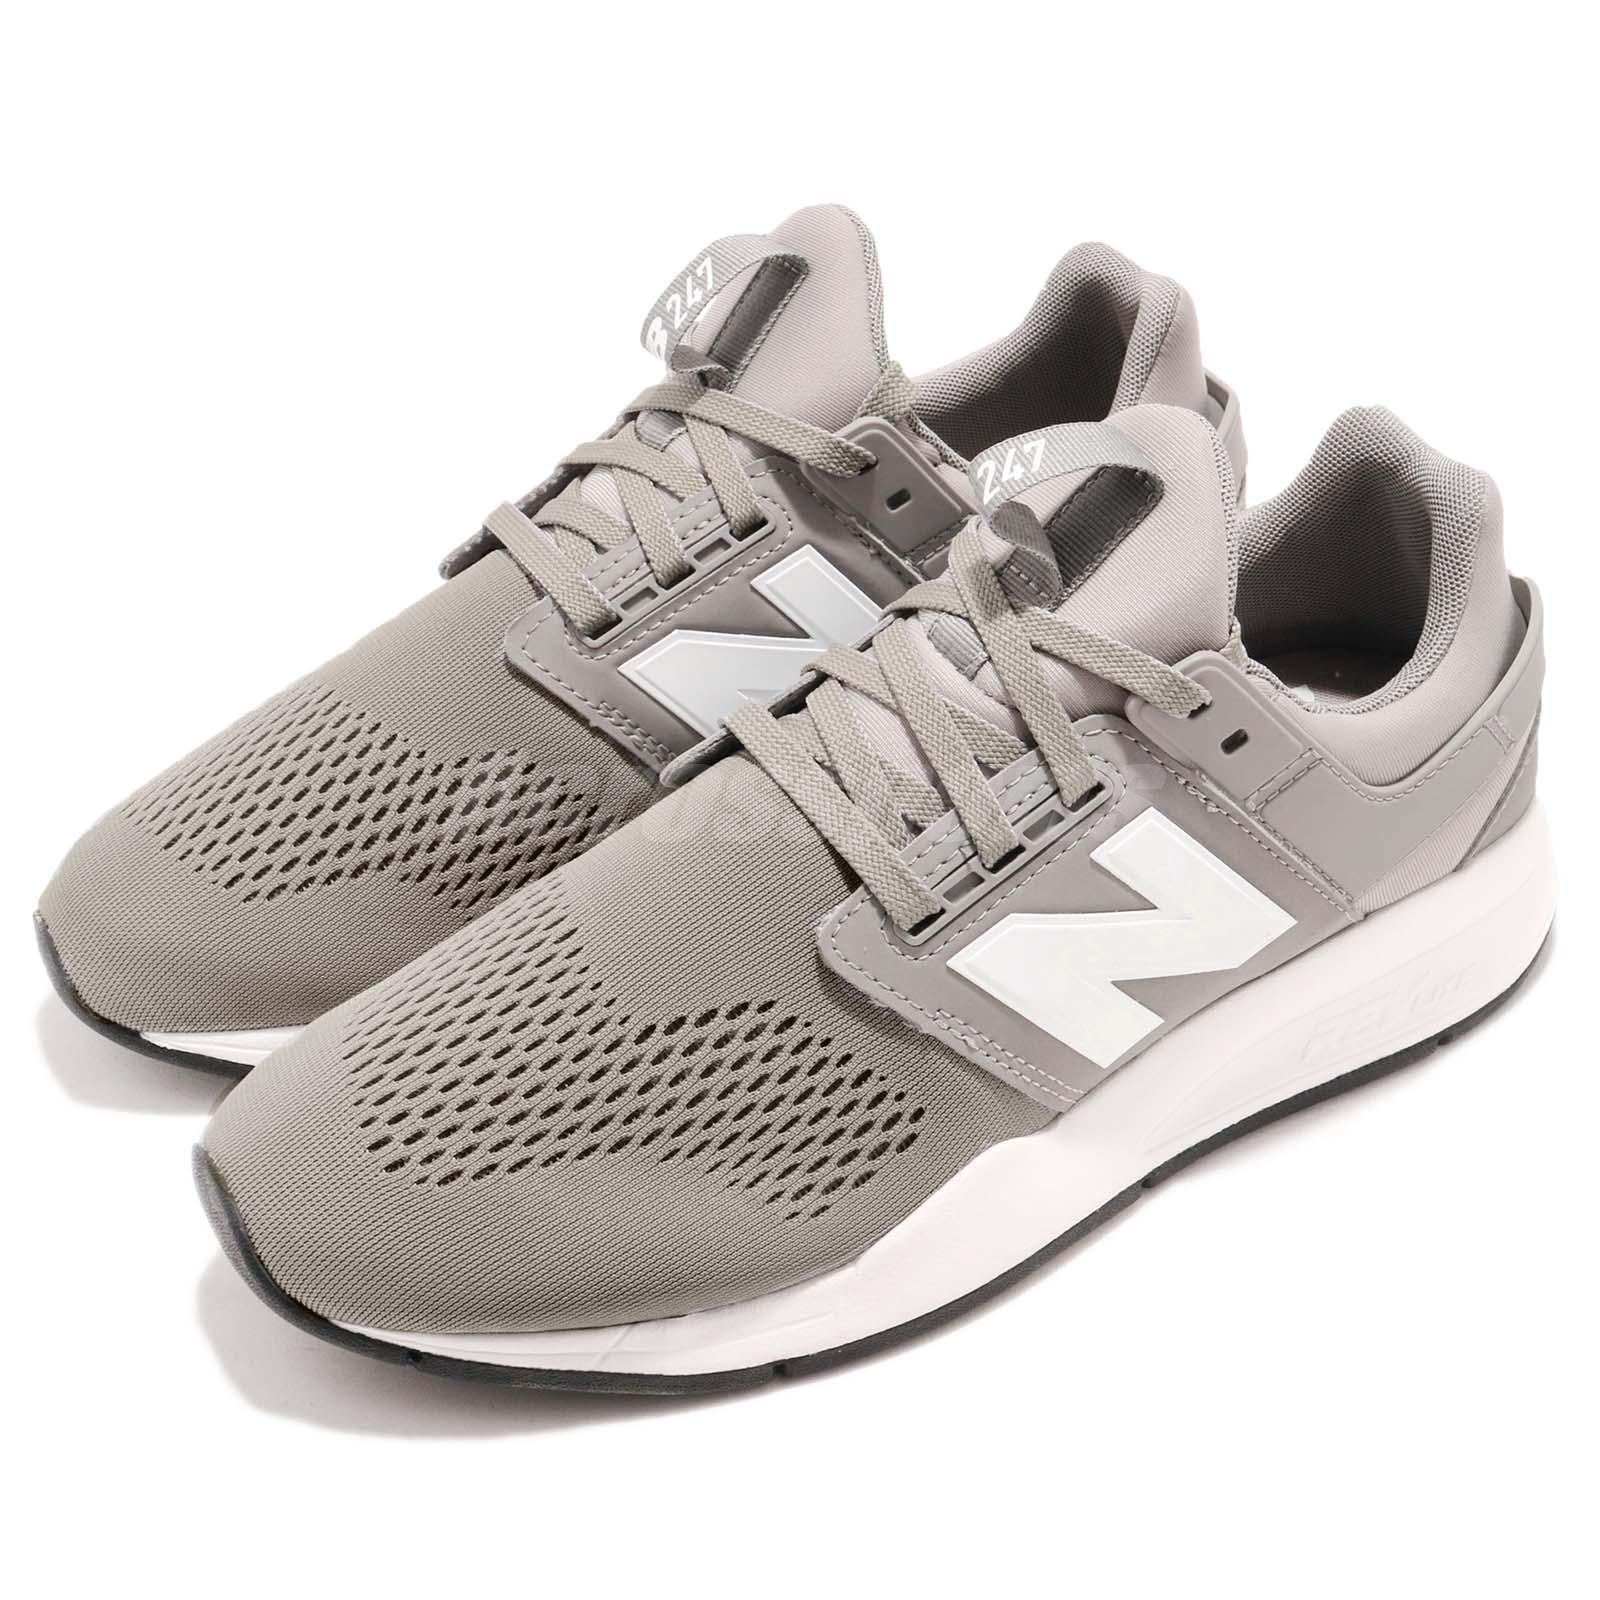 New Balance MS247EG D  Gris  blanc homme fonctionnement Casual chaussures Sneakers MS247EGD